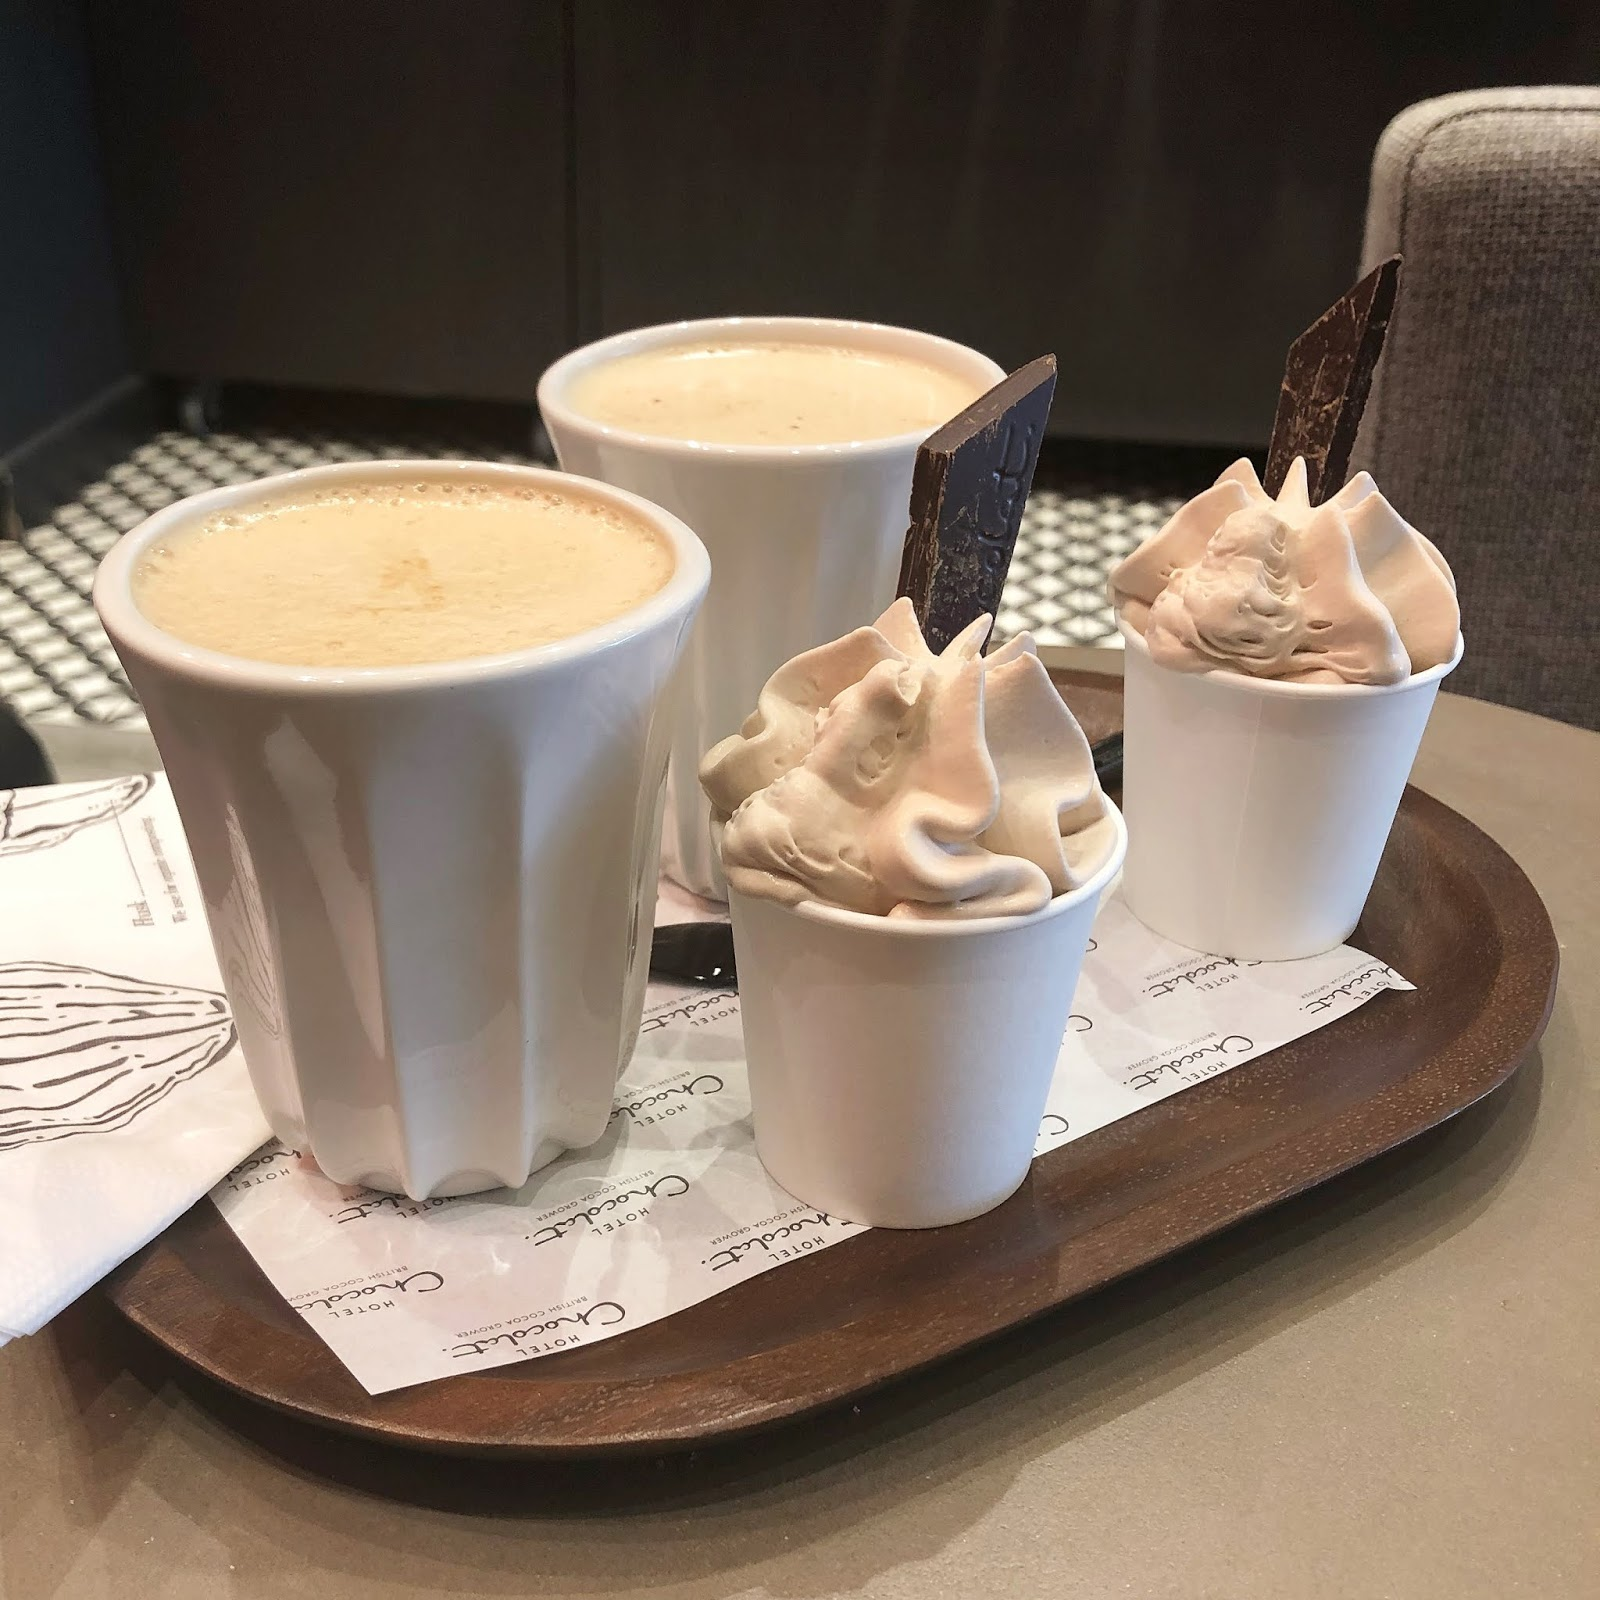 Best Hot Chocolate North East - Hotel Chocolat